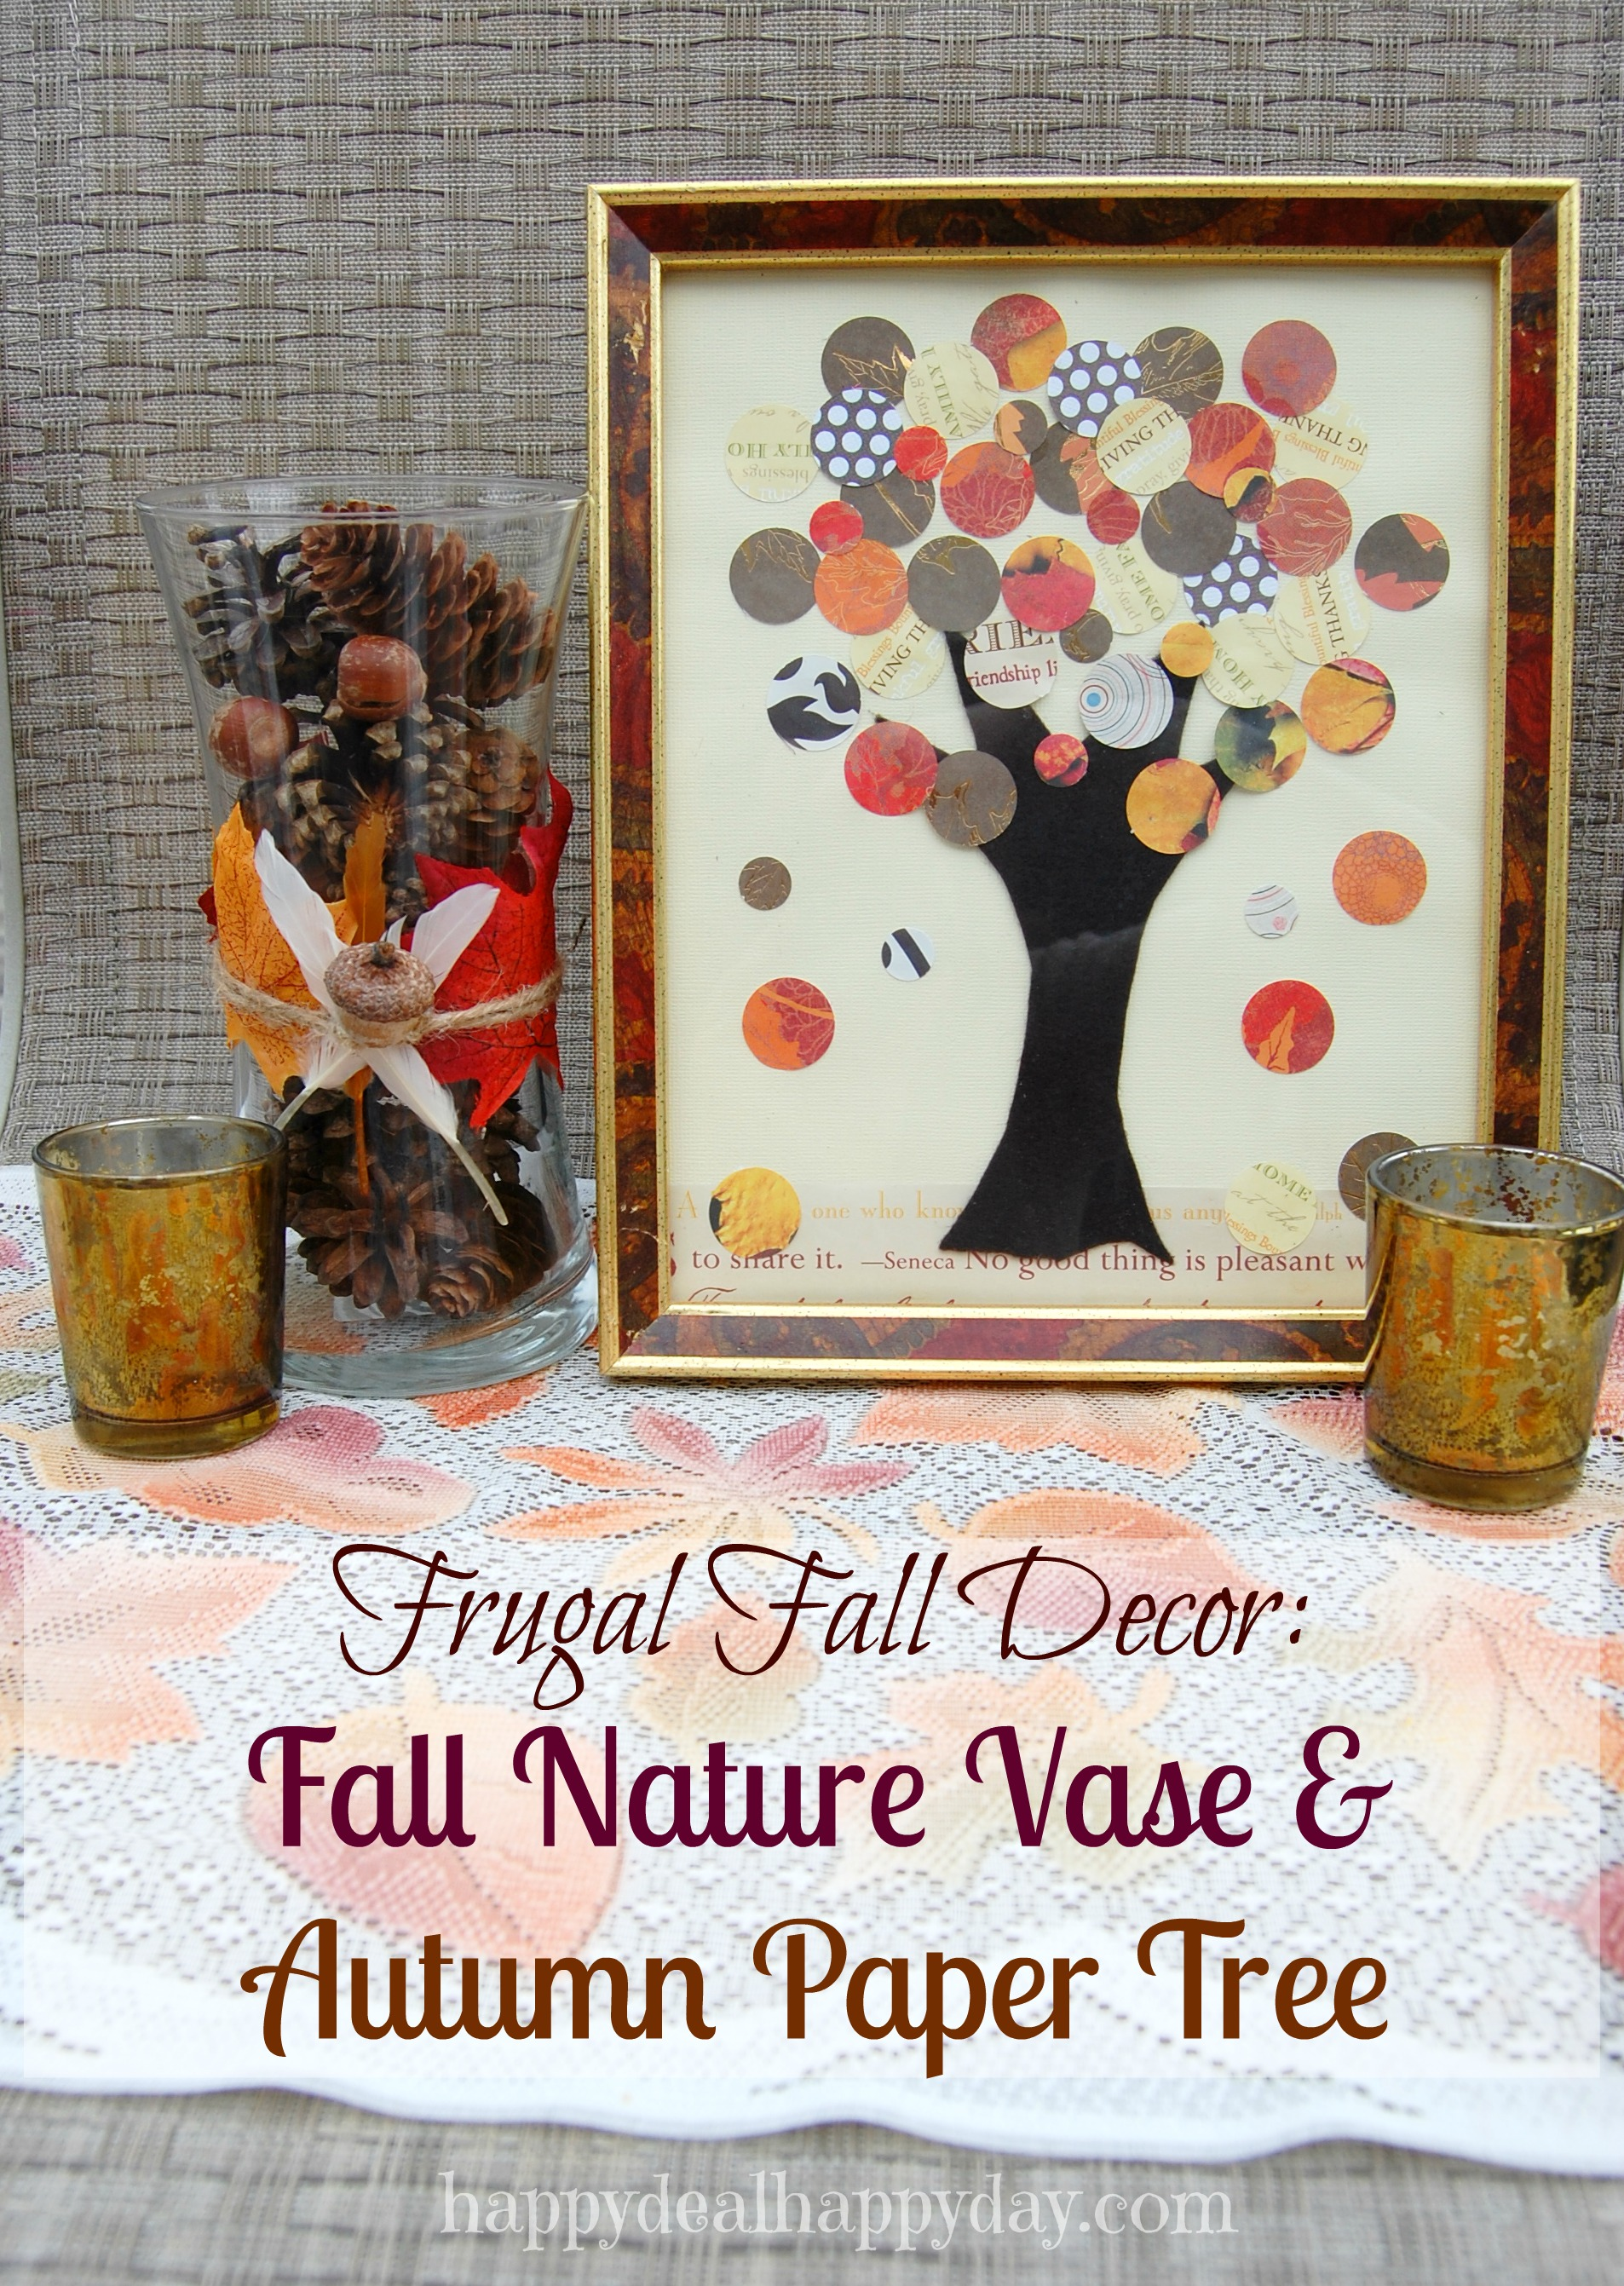 Frugal Fall Decor:  Fall Nature Vase & Autumn Paper Tree